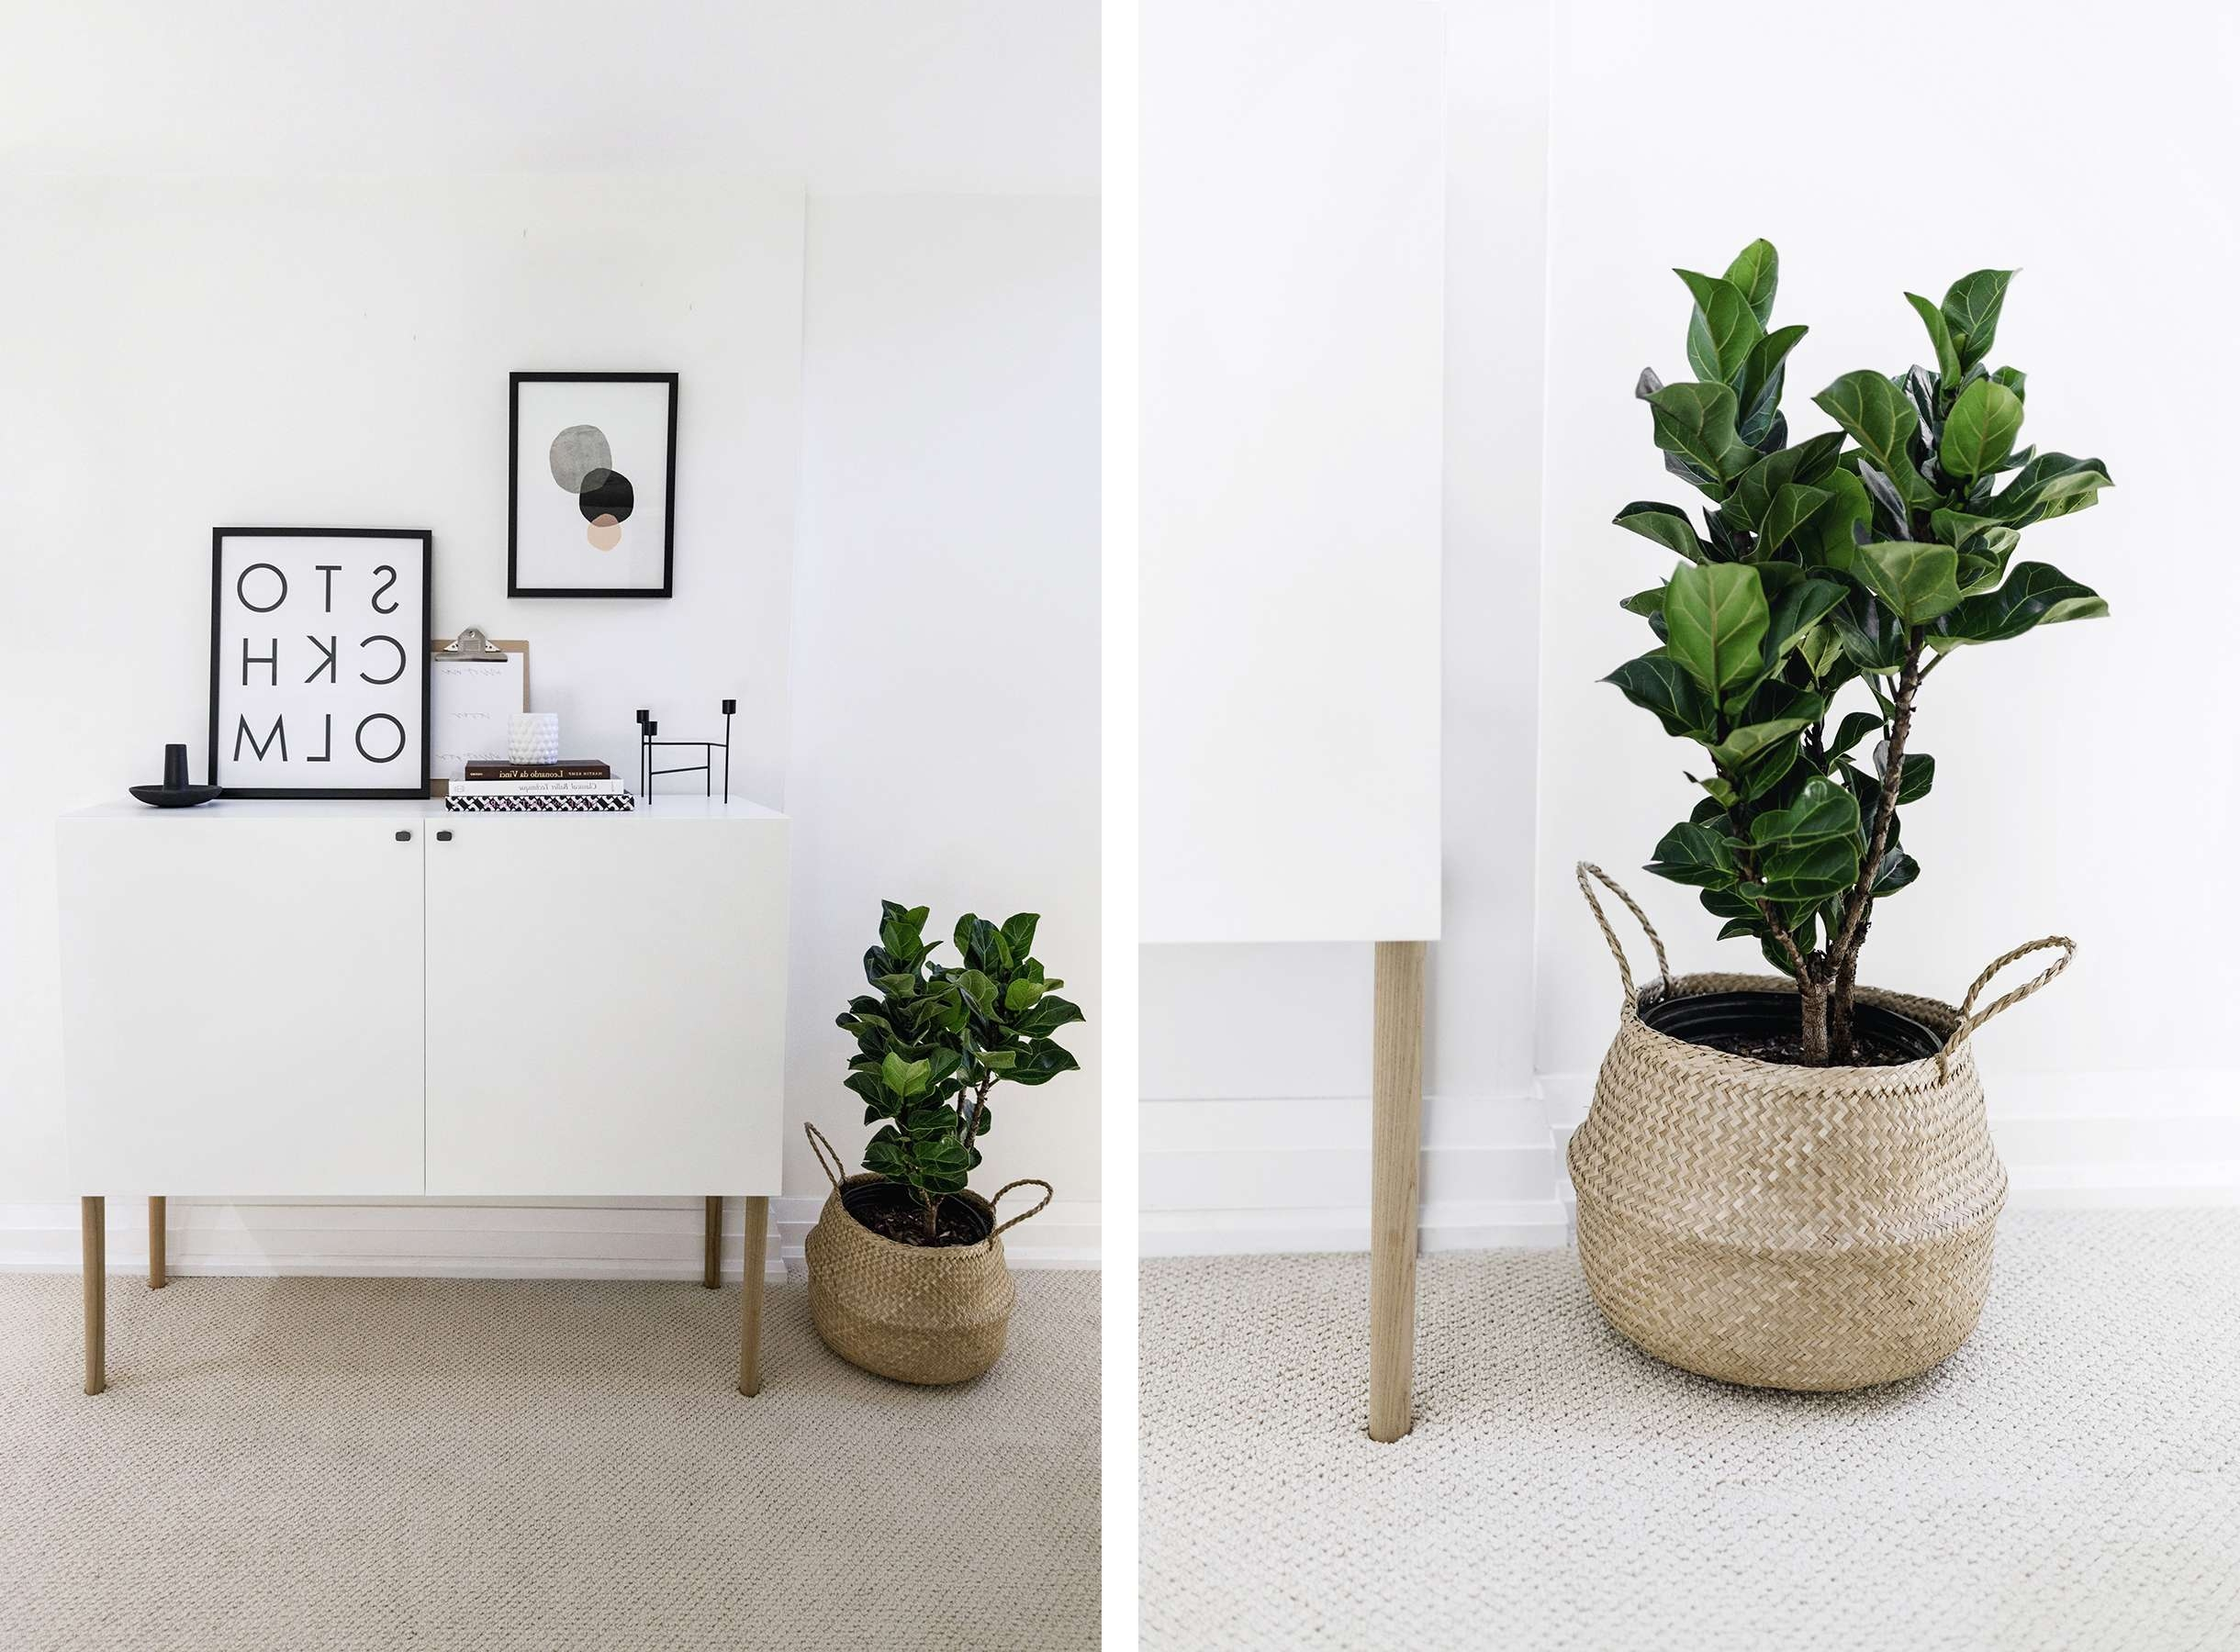 Ikea Besta Hack: Scandinavian Sideboard Cabinet | Happy Grey Lucky With Ikea Besta Sideboards (View 10 of 20)